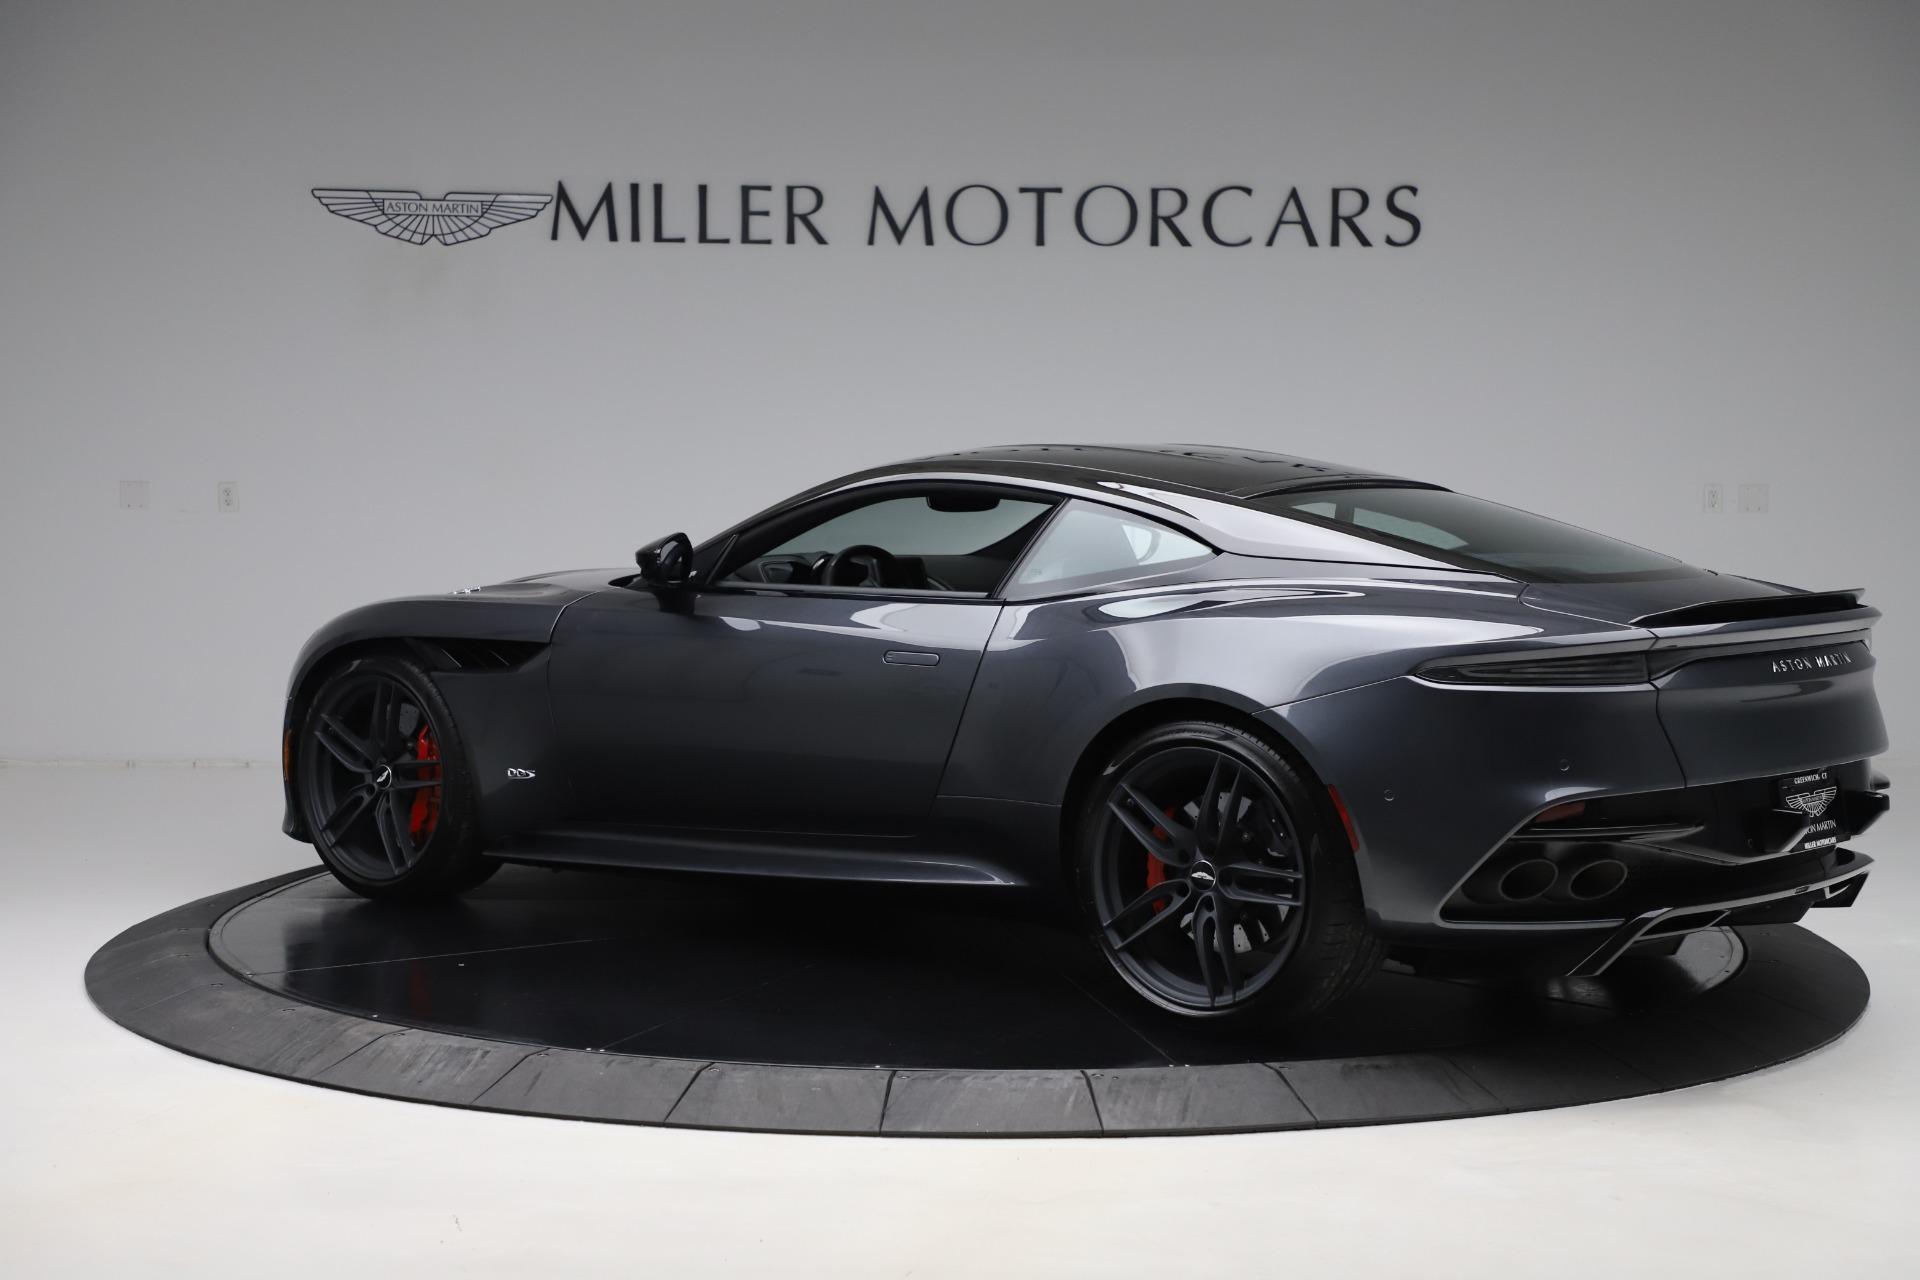 Used 2019 Aston Martin DBS Superleggera Coupe For Sale In Greenwich, CT. Alfa Romeo of Greenwich, A1438B 3570_p4